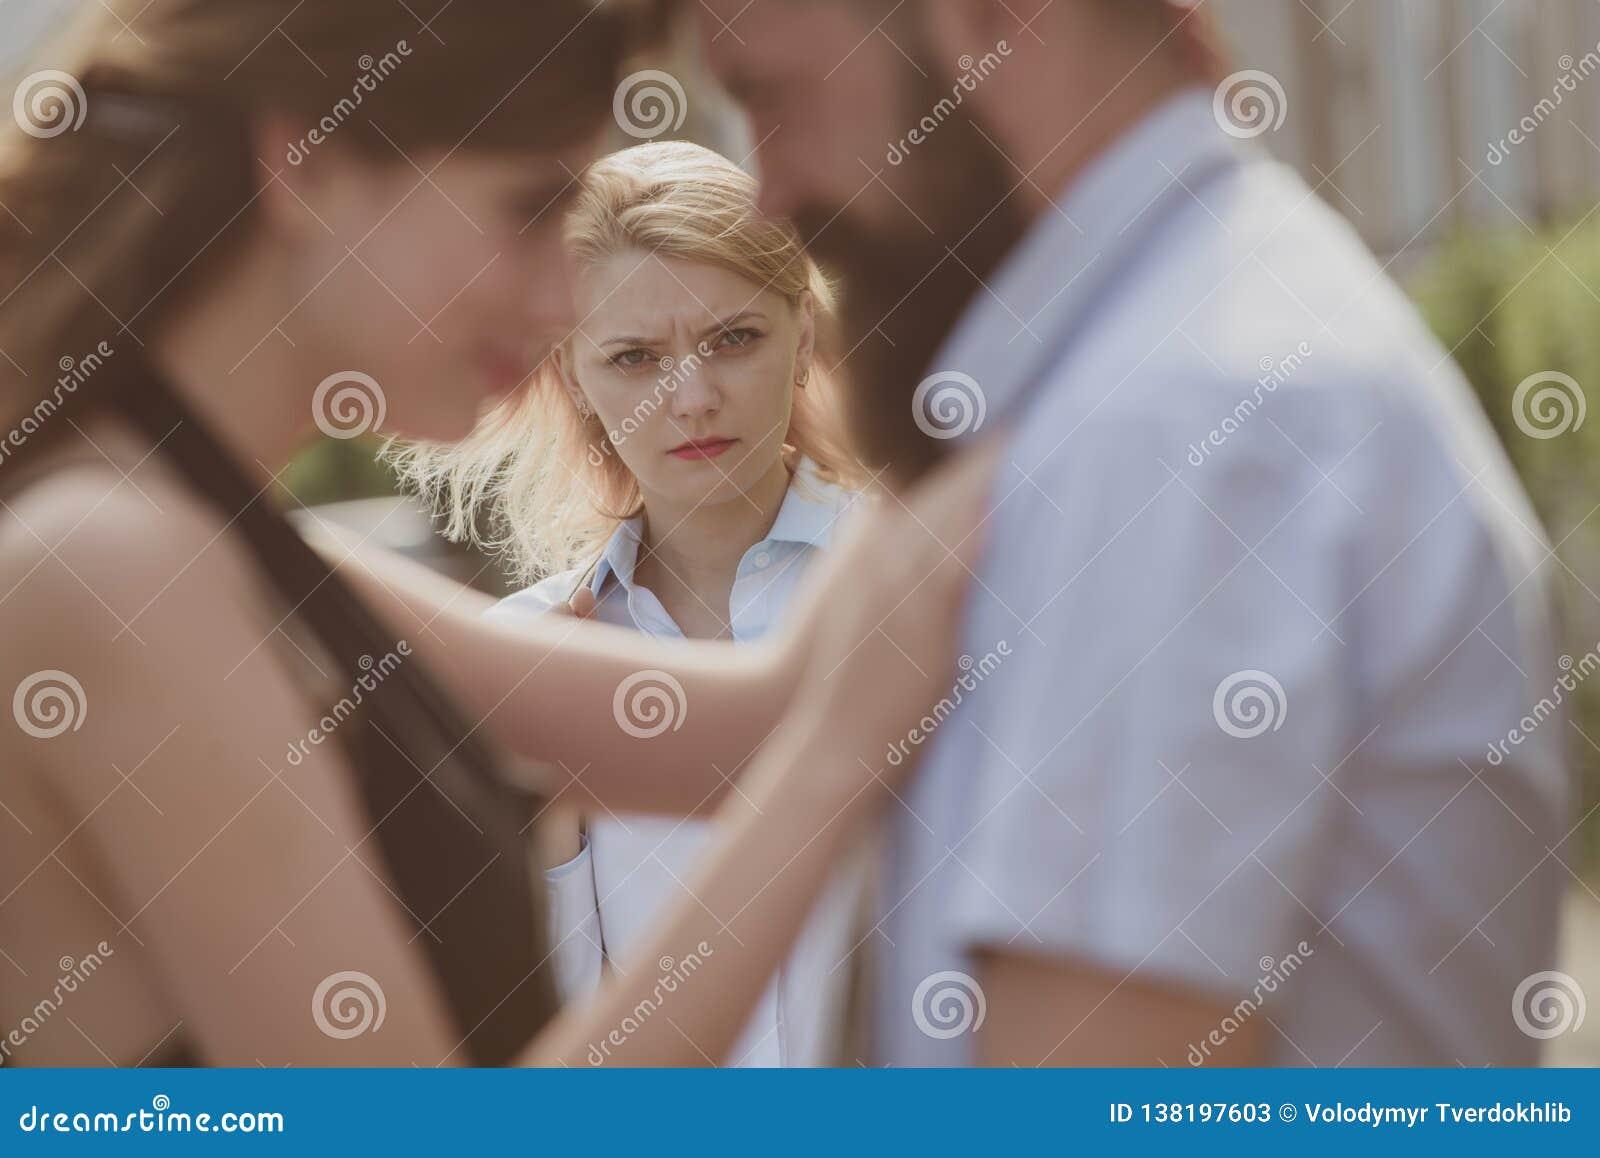 dating site goa